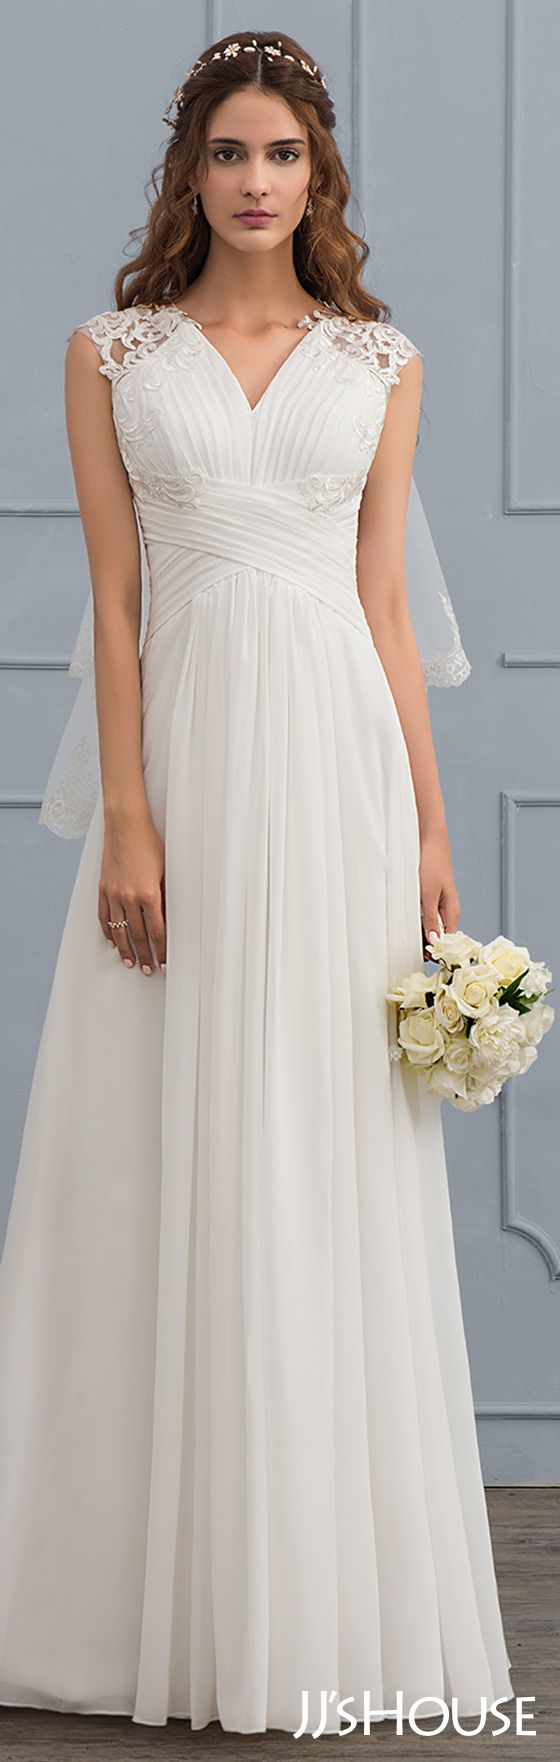 Jjshouse Wedding Wedding Dresses Pinterest